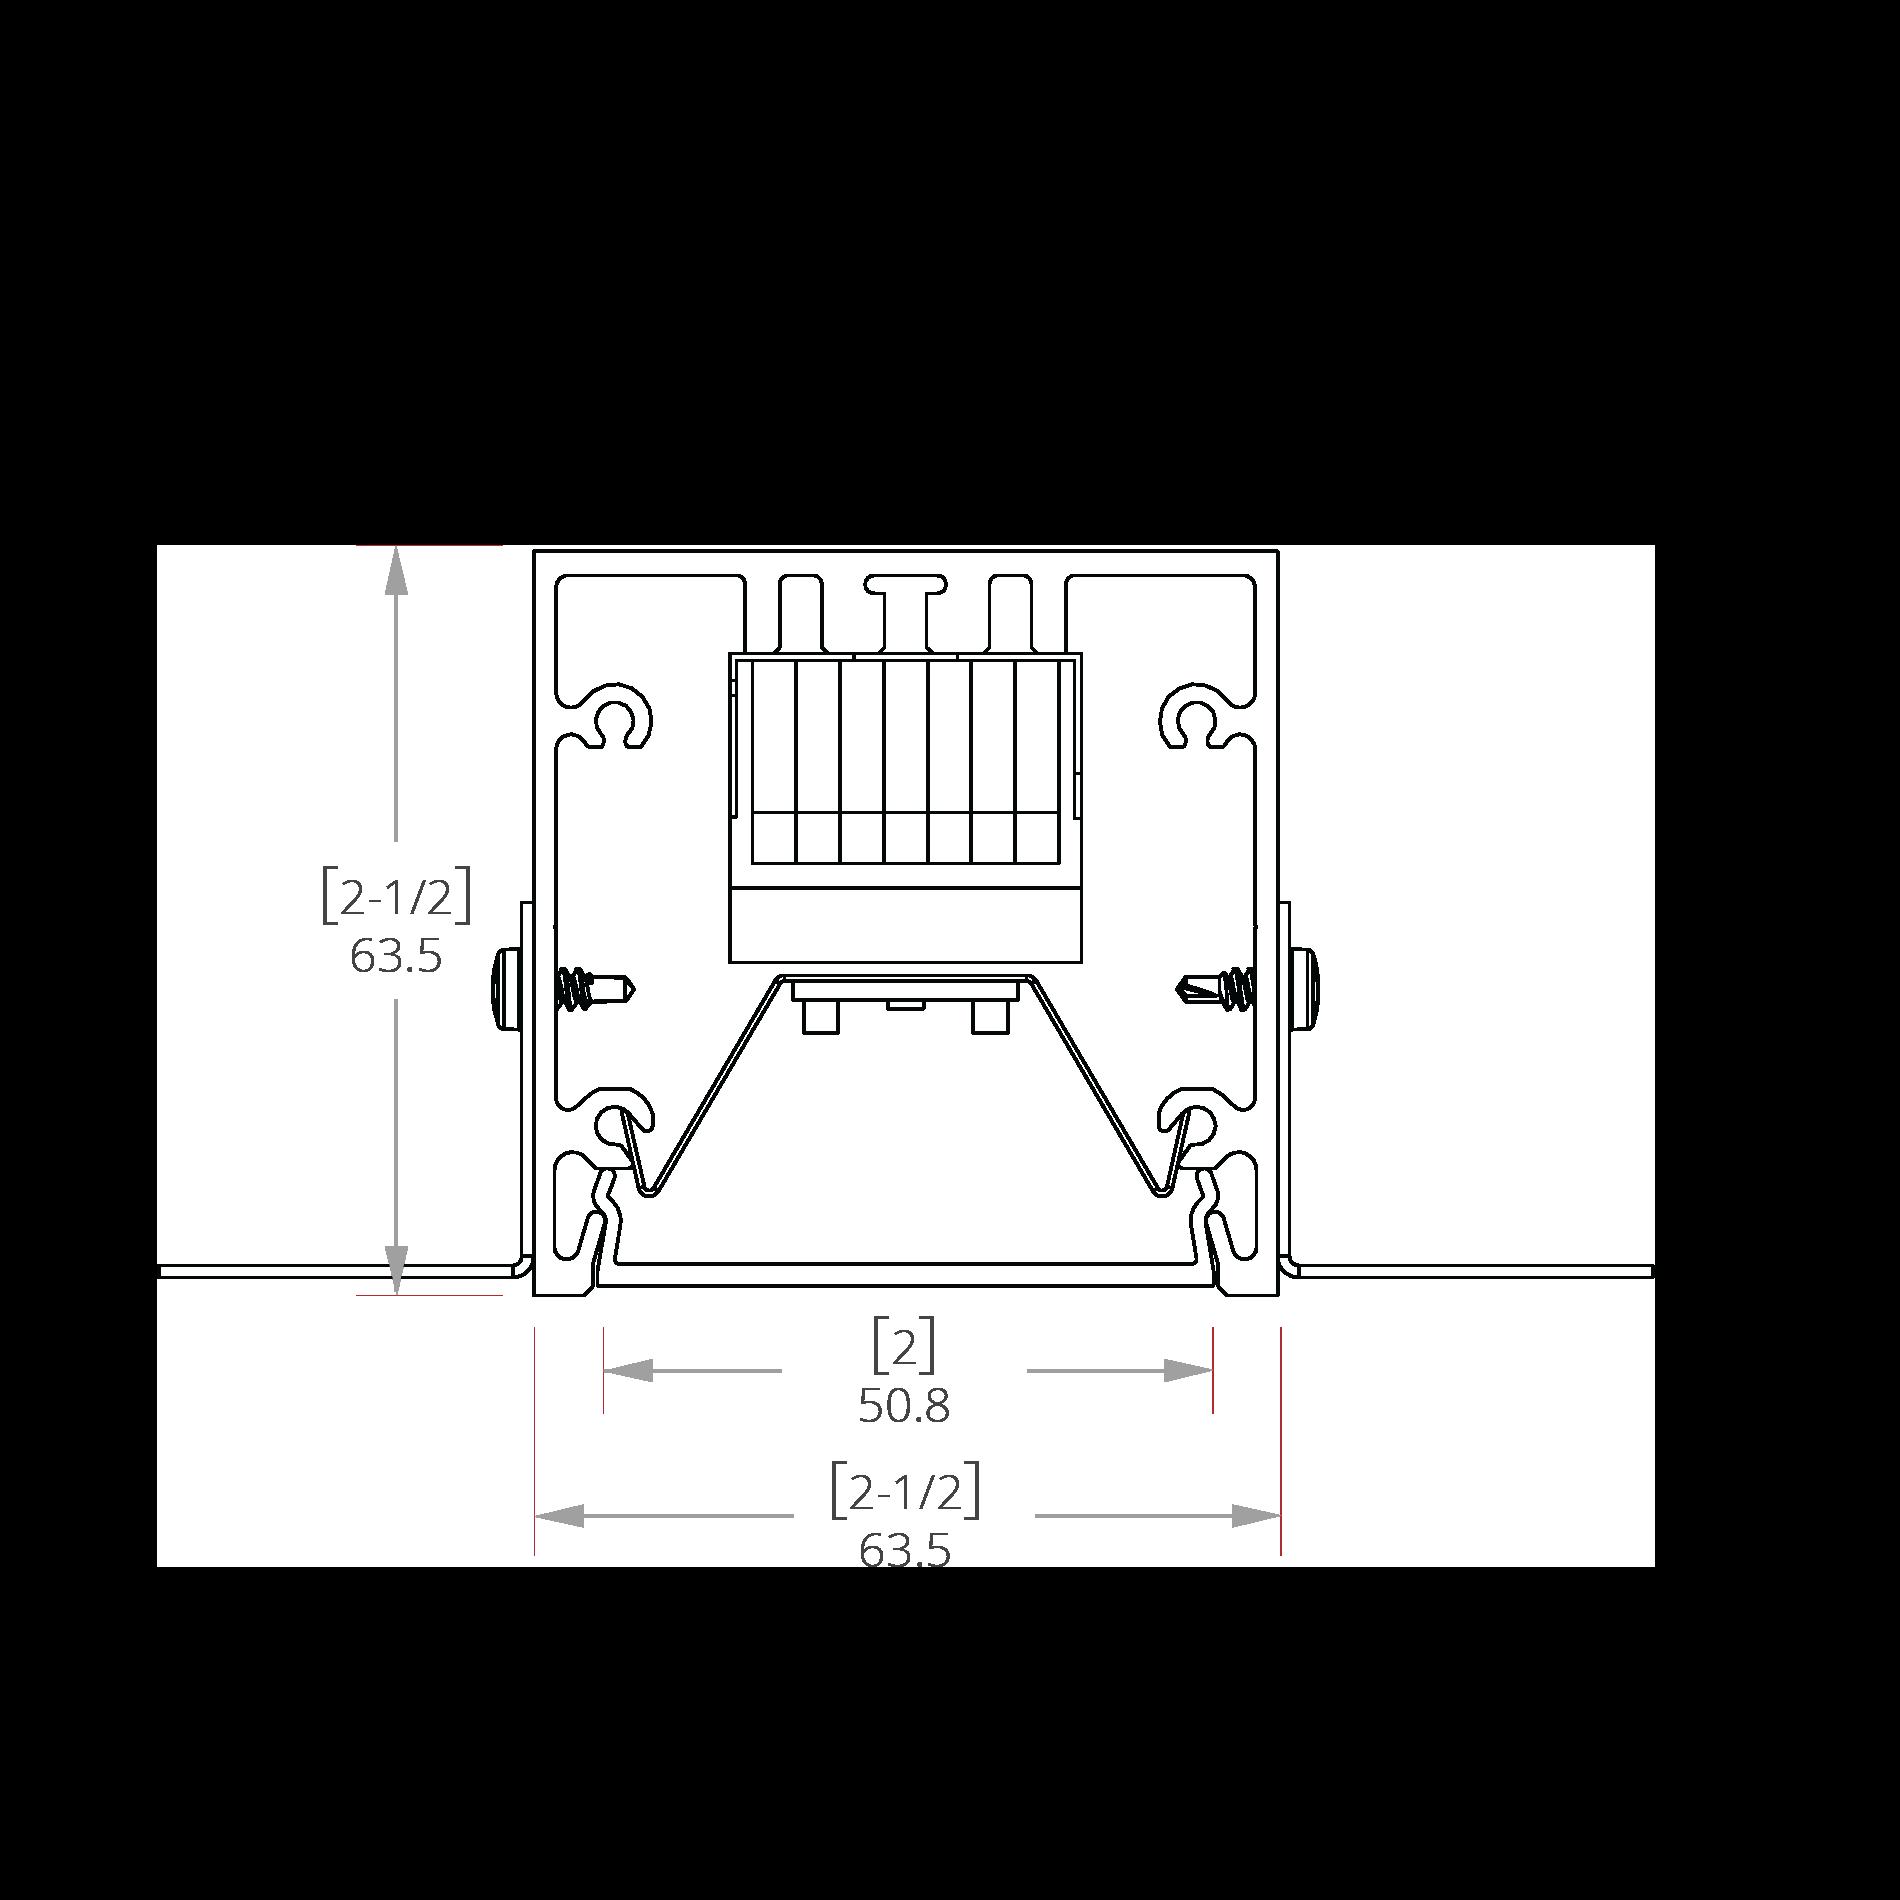 Iridium 2 Line Drawing